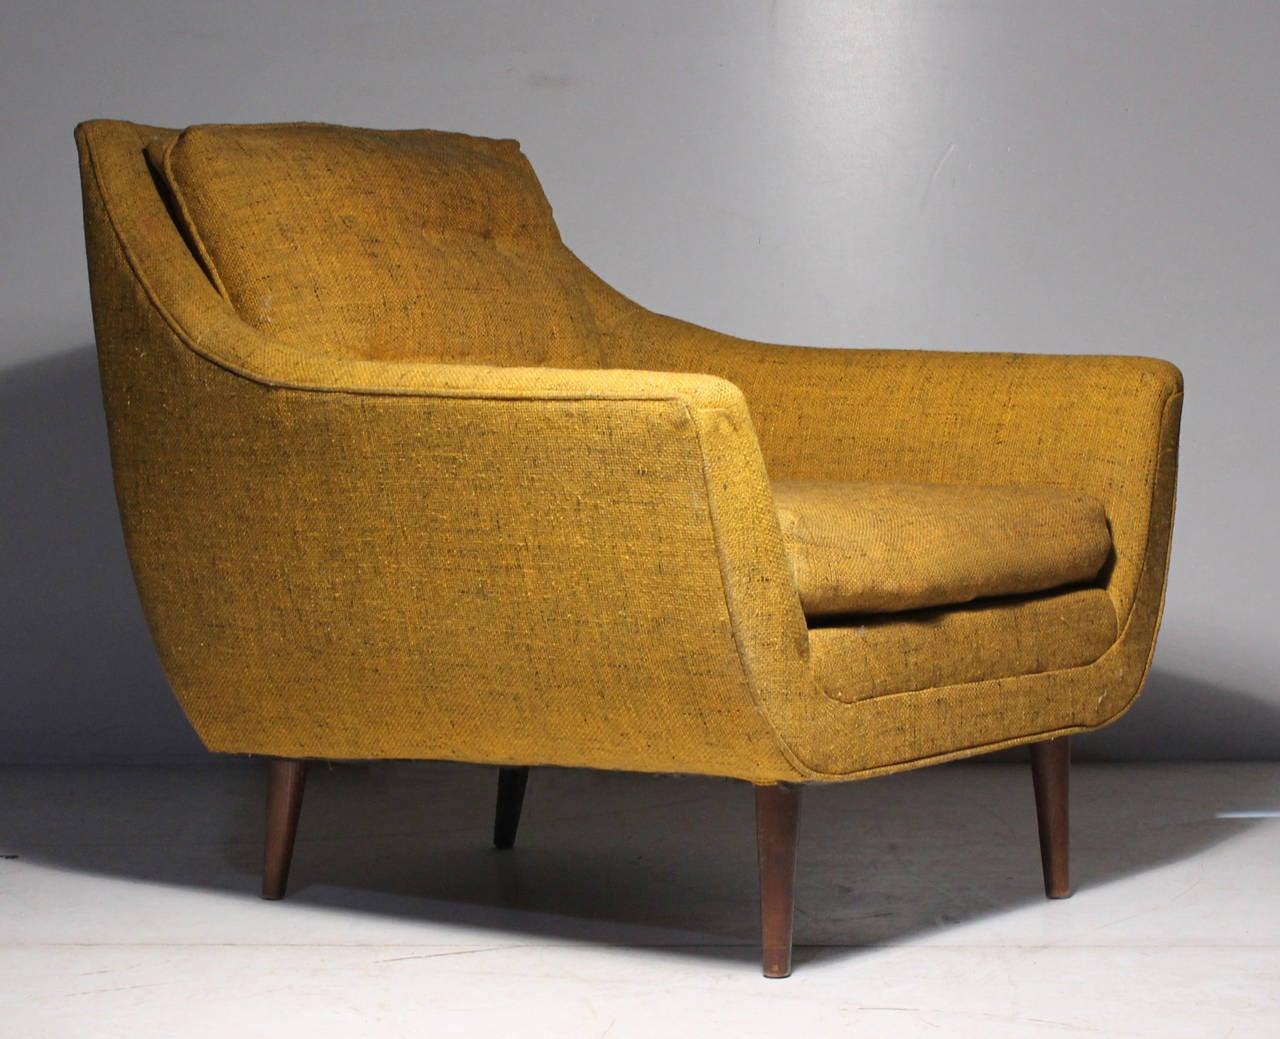 Danish Modern Vintage Lounge Chair Attrib Selig Milo Baughman   Adrian  Pearsall 2Danish Modern Vintage Lounge Chair Attrib Selig Milo Baughman  . Modern Yellow Lounge Chair. Home Design Ideas